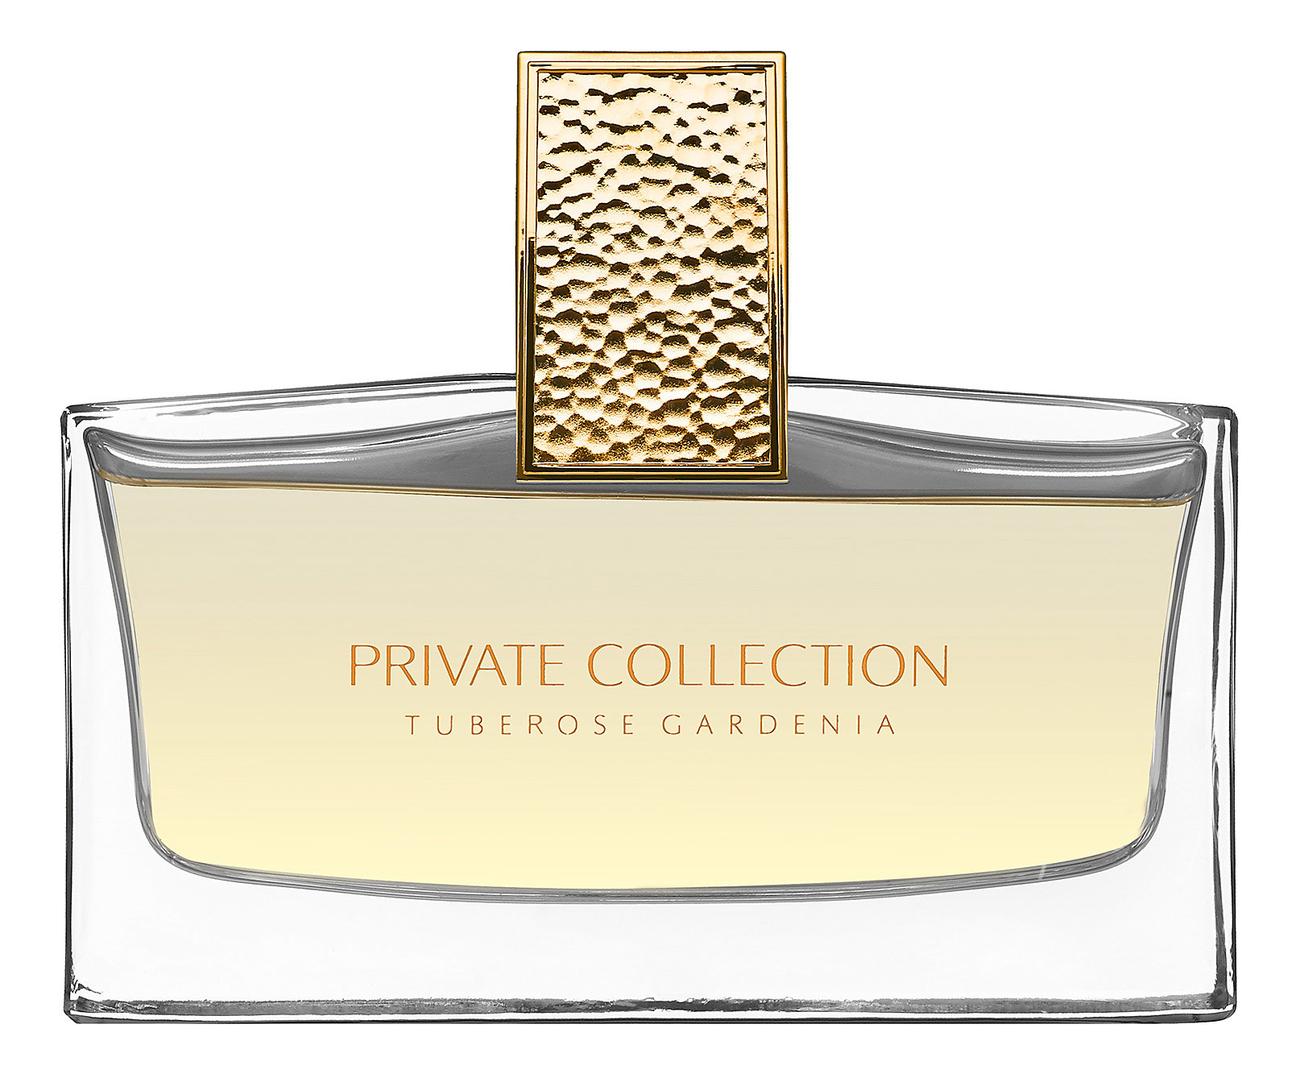 Купить Private Collection Tuberose Gardenia: парфюмерная вода 75мл, Estee Lauder